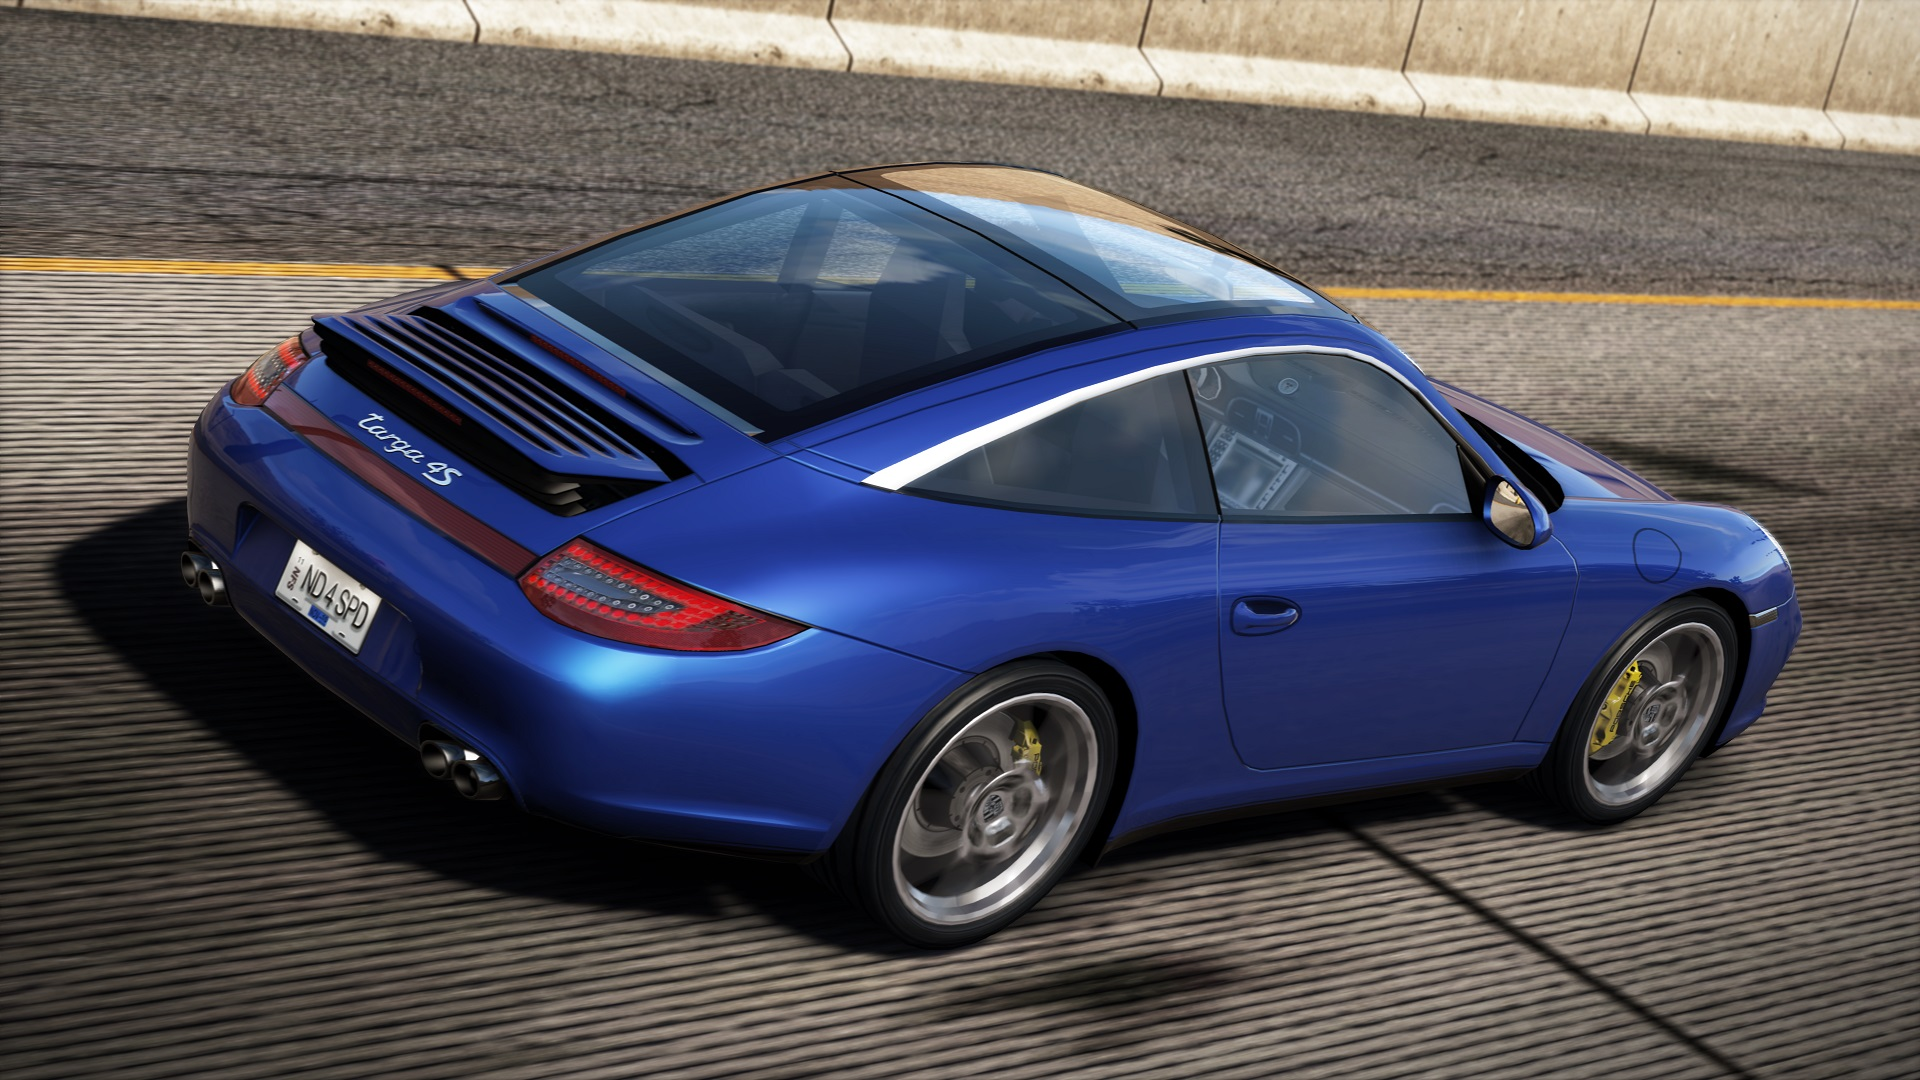 Porsche 911 Targa 4S | Need for Sd Wiki | FANDOM powered by Wikia